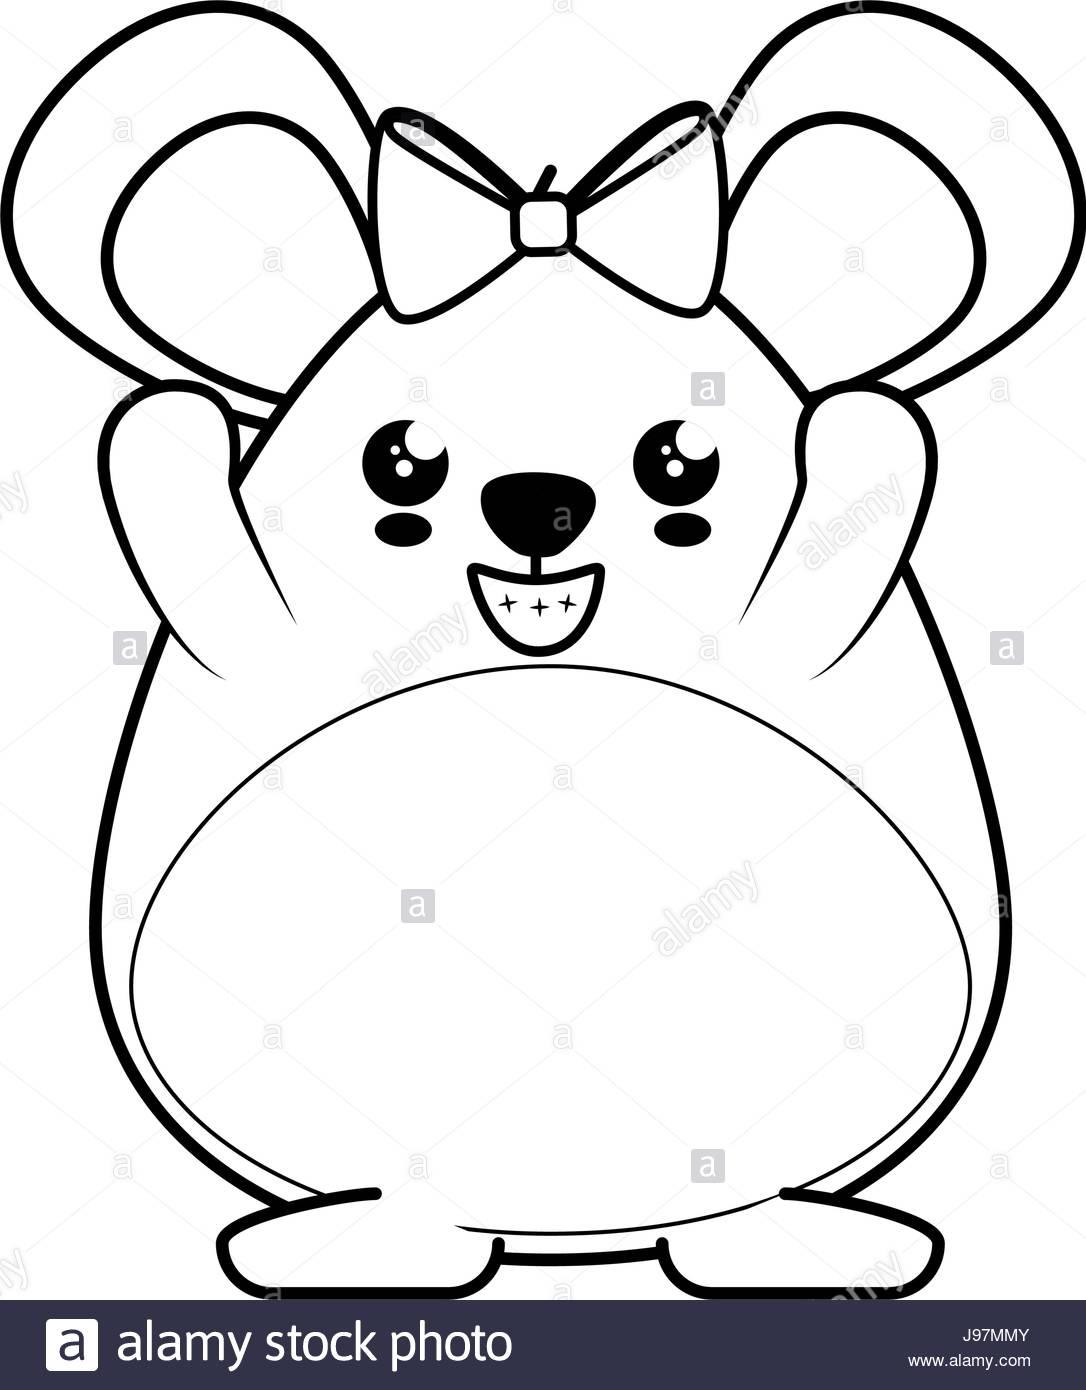 1086x1390 Hamster Kawaii Cartoon Stock Vector Art Amp Illustration, Vector